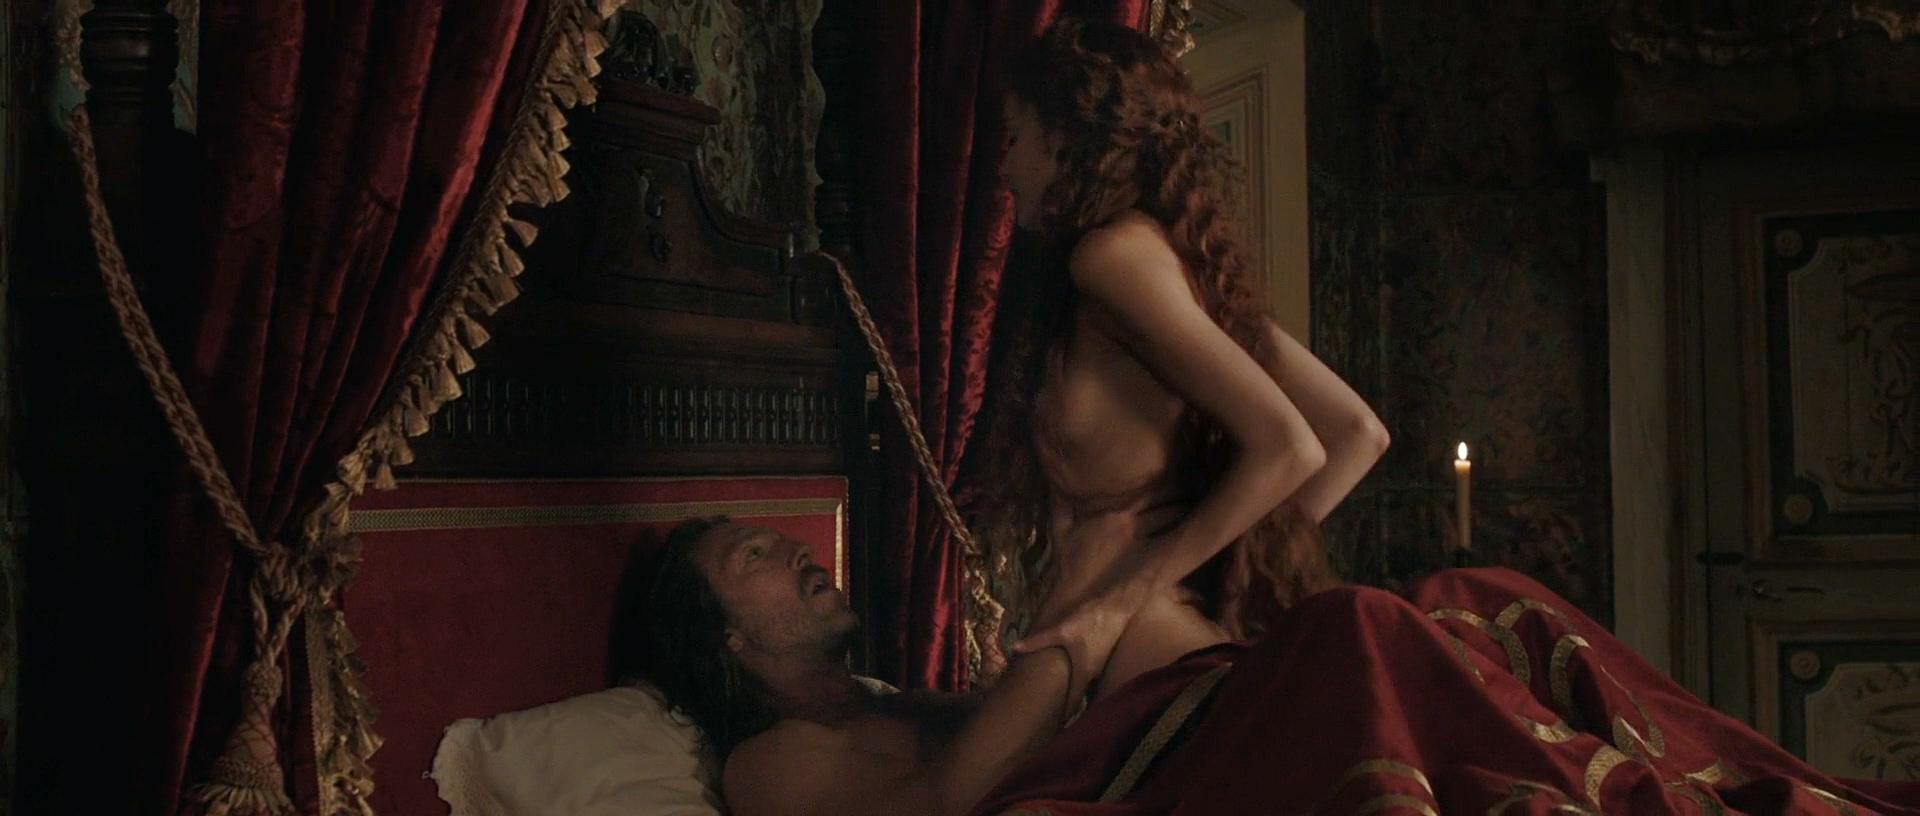 Stacy Martin nude butt others nude - Il racconto dei racconti (2015) hd1080p (2)